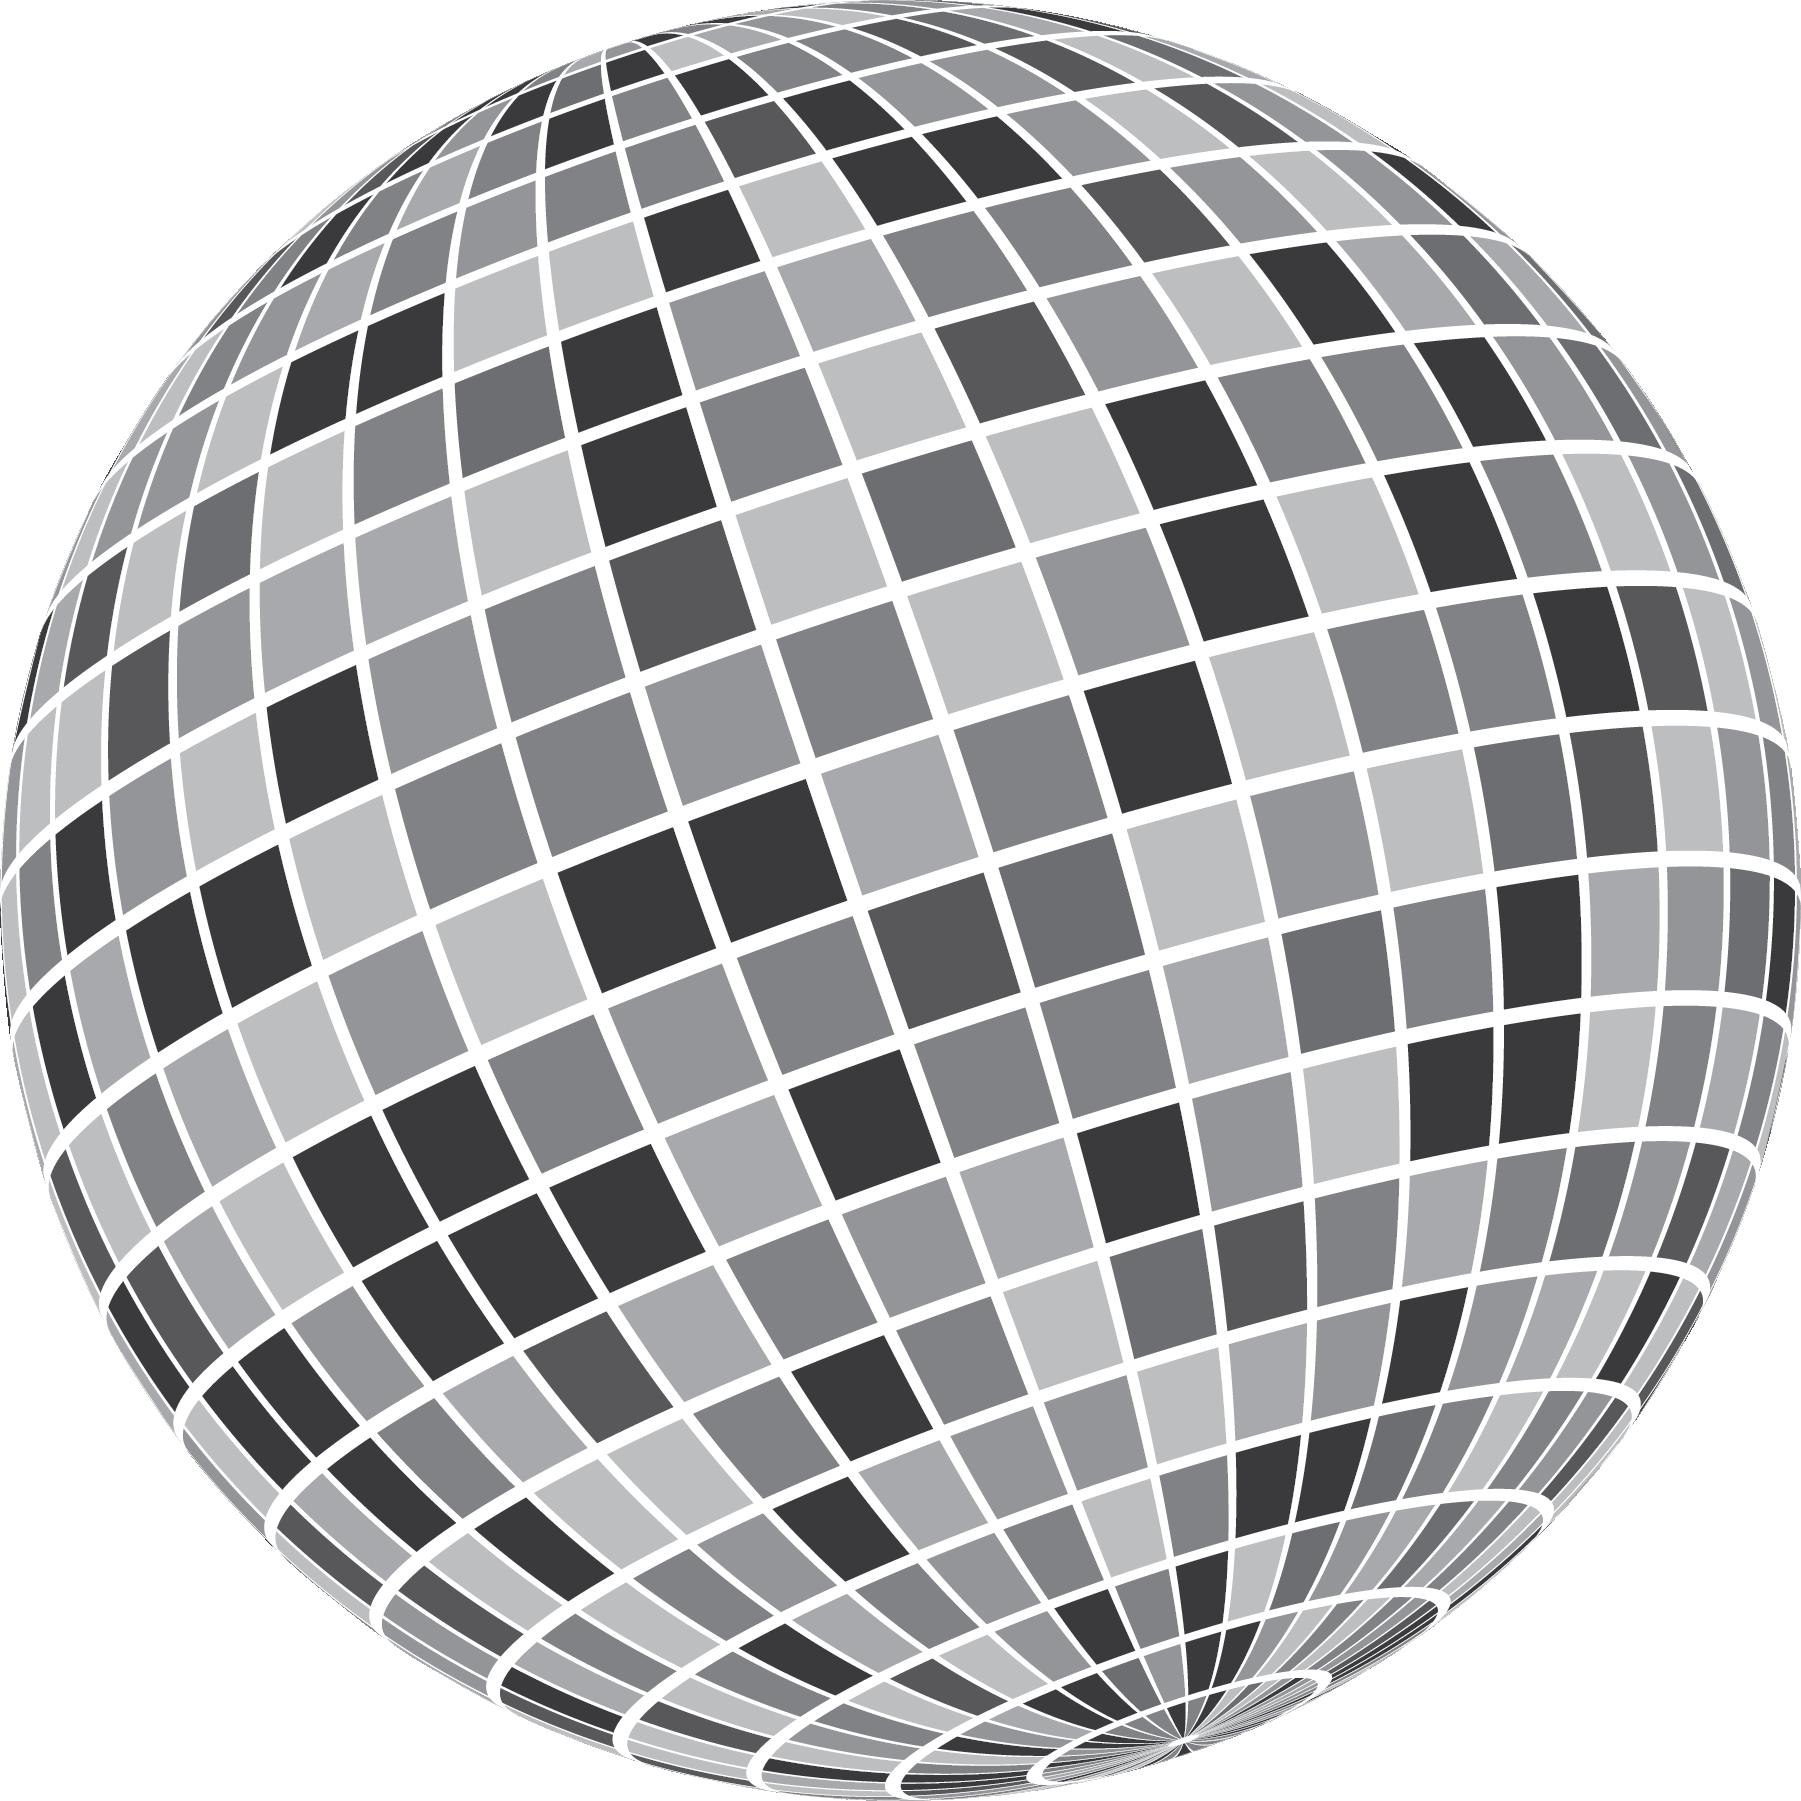 Disco Ball Drawing Disco Ball Drawing Disco Ball Disco Ball Ball Drawing Disco